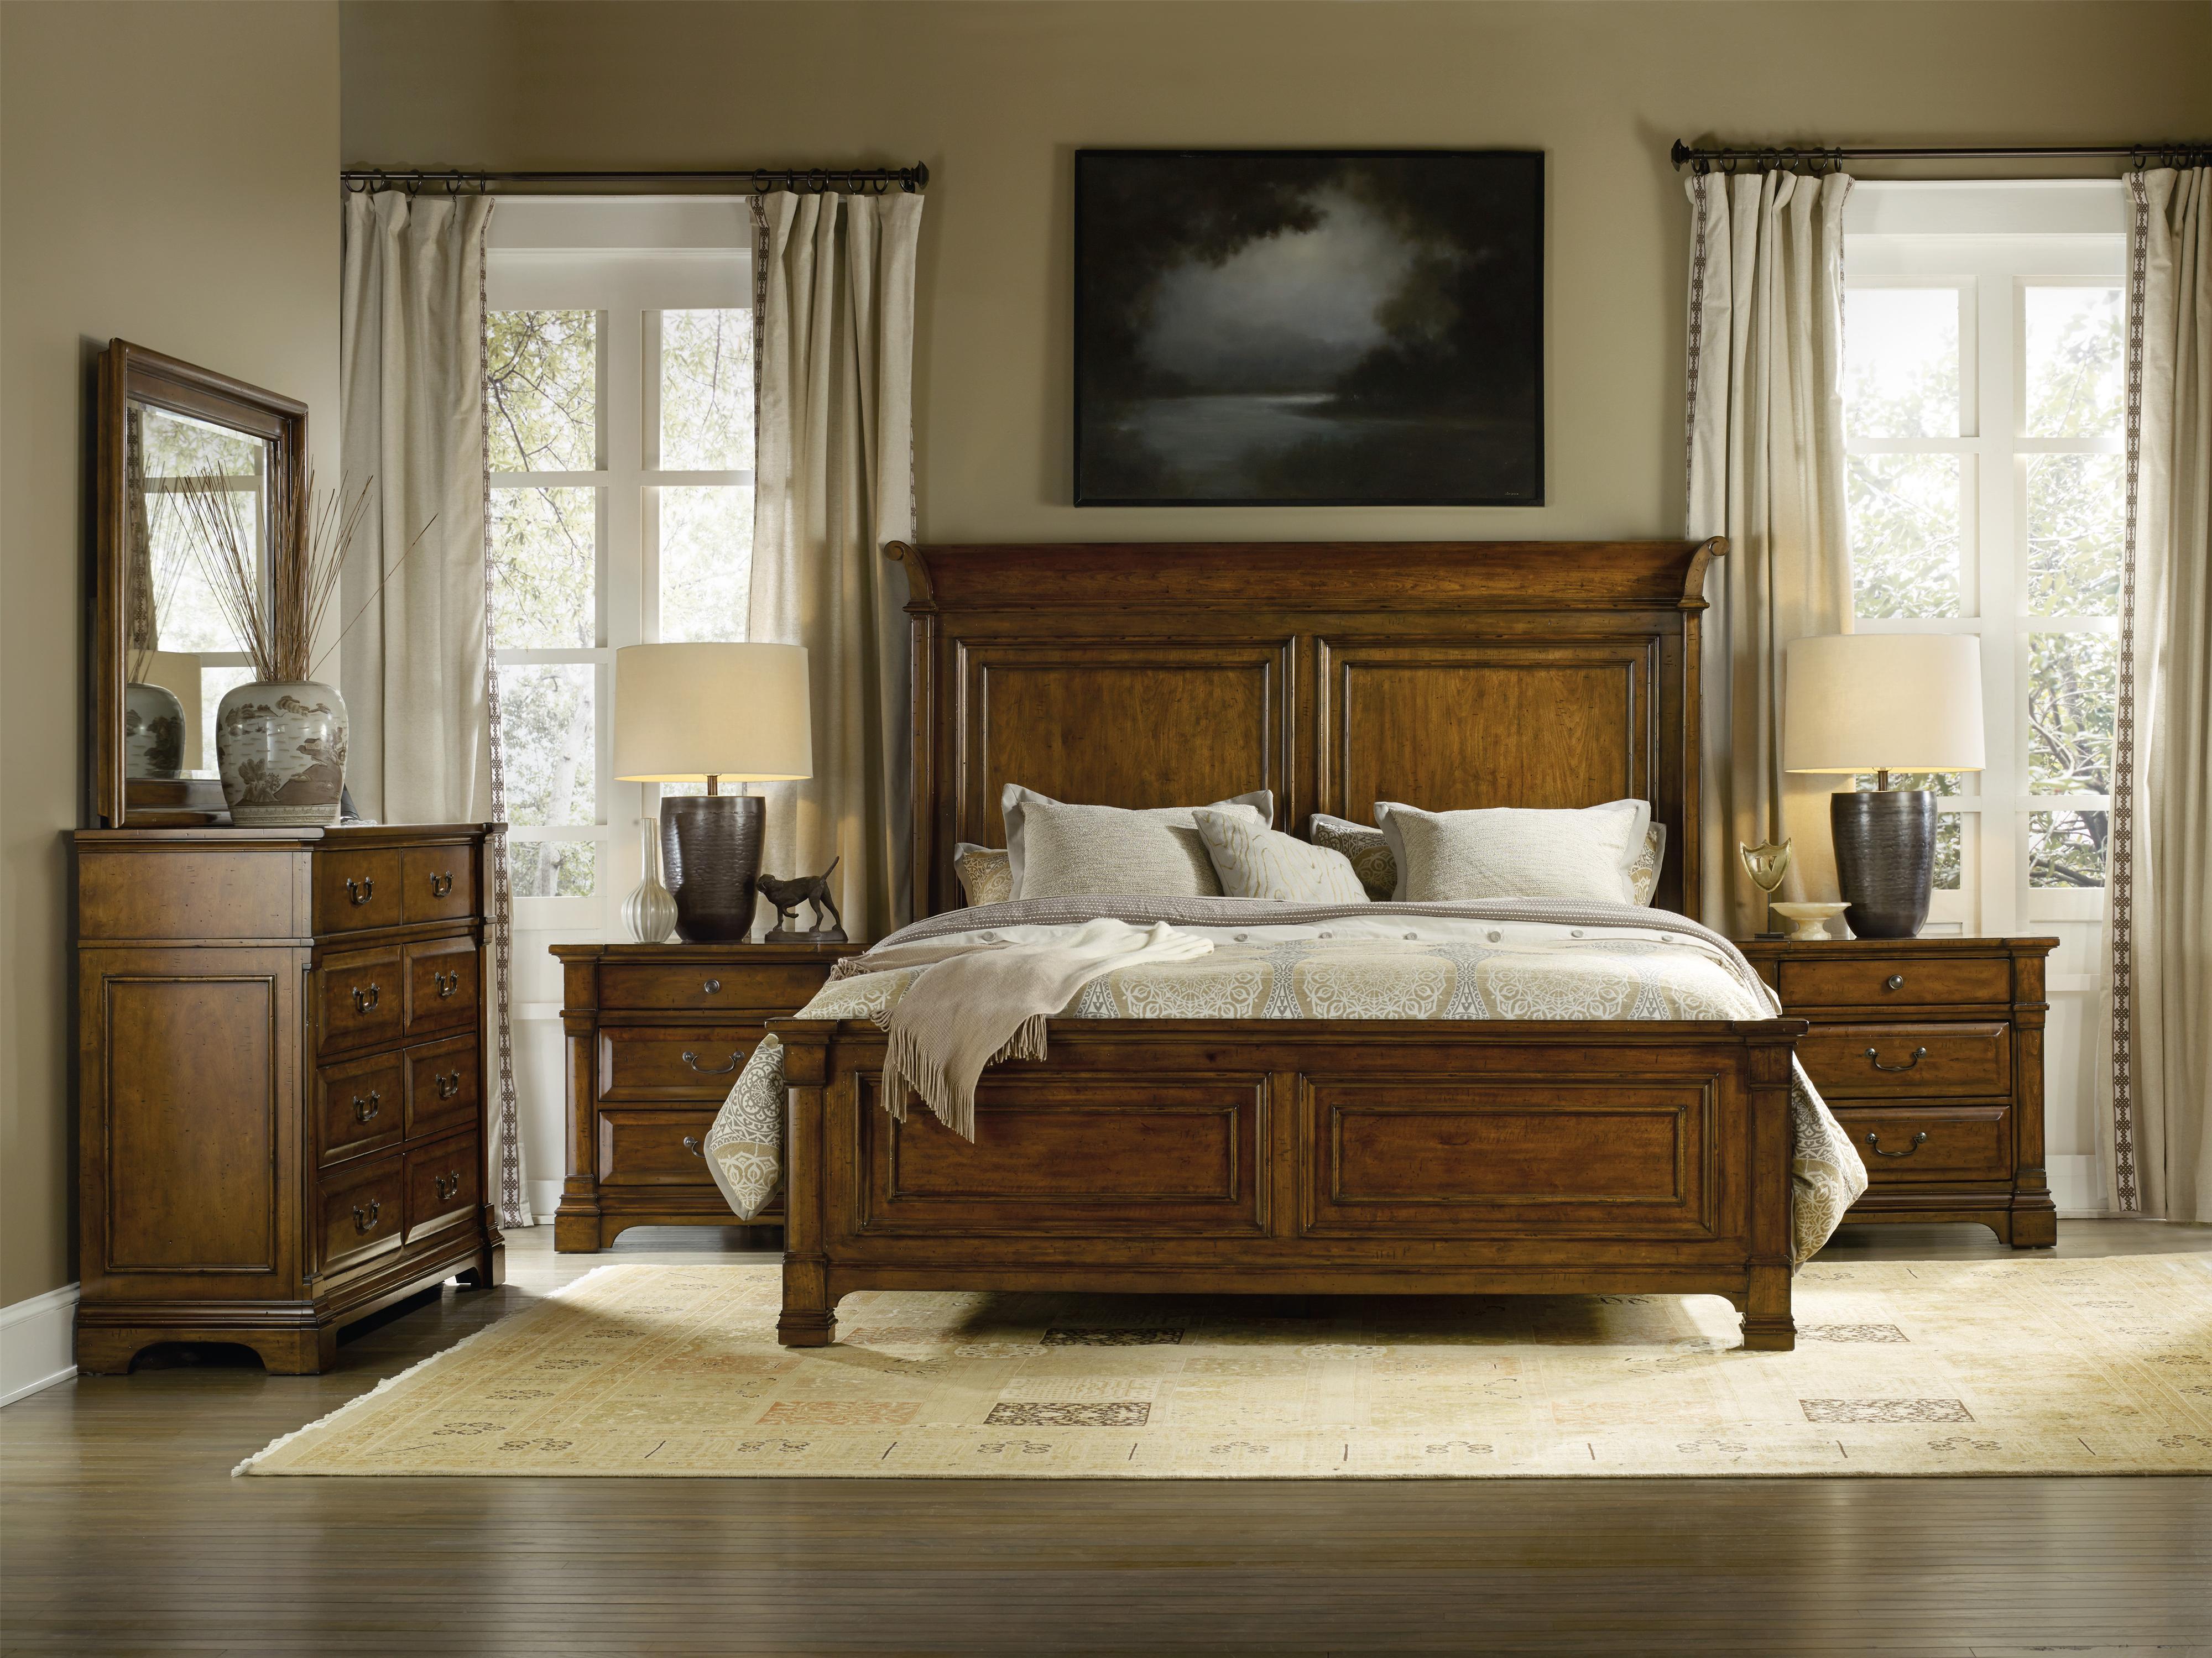 Hooker Furniture Tynecastle King Panel Bedroom Group - Item Number: 5323 K Bedroom Group 1